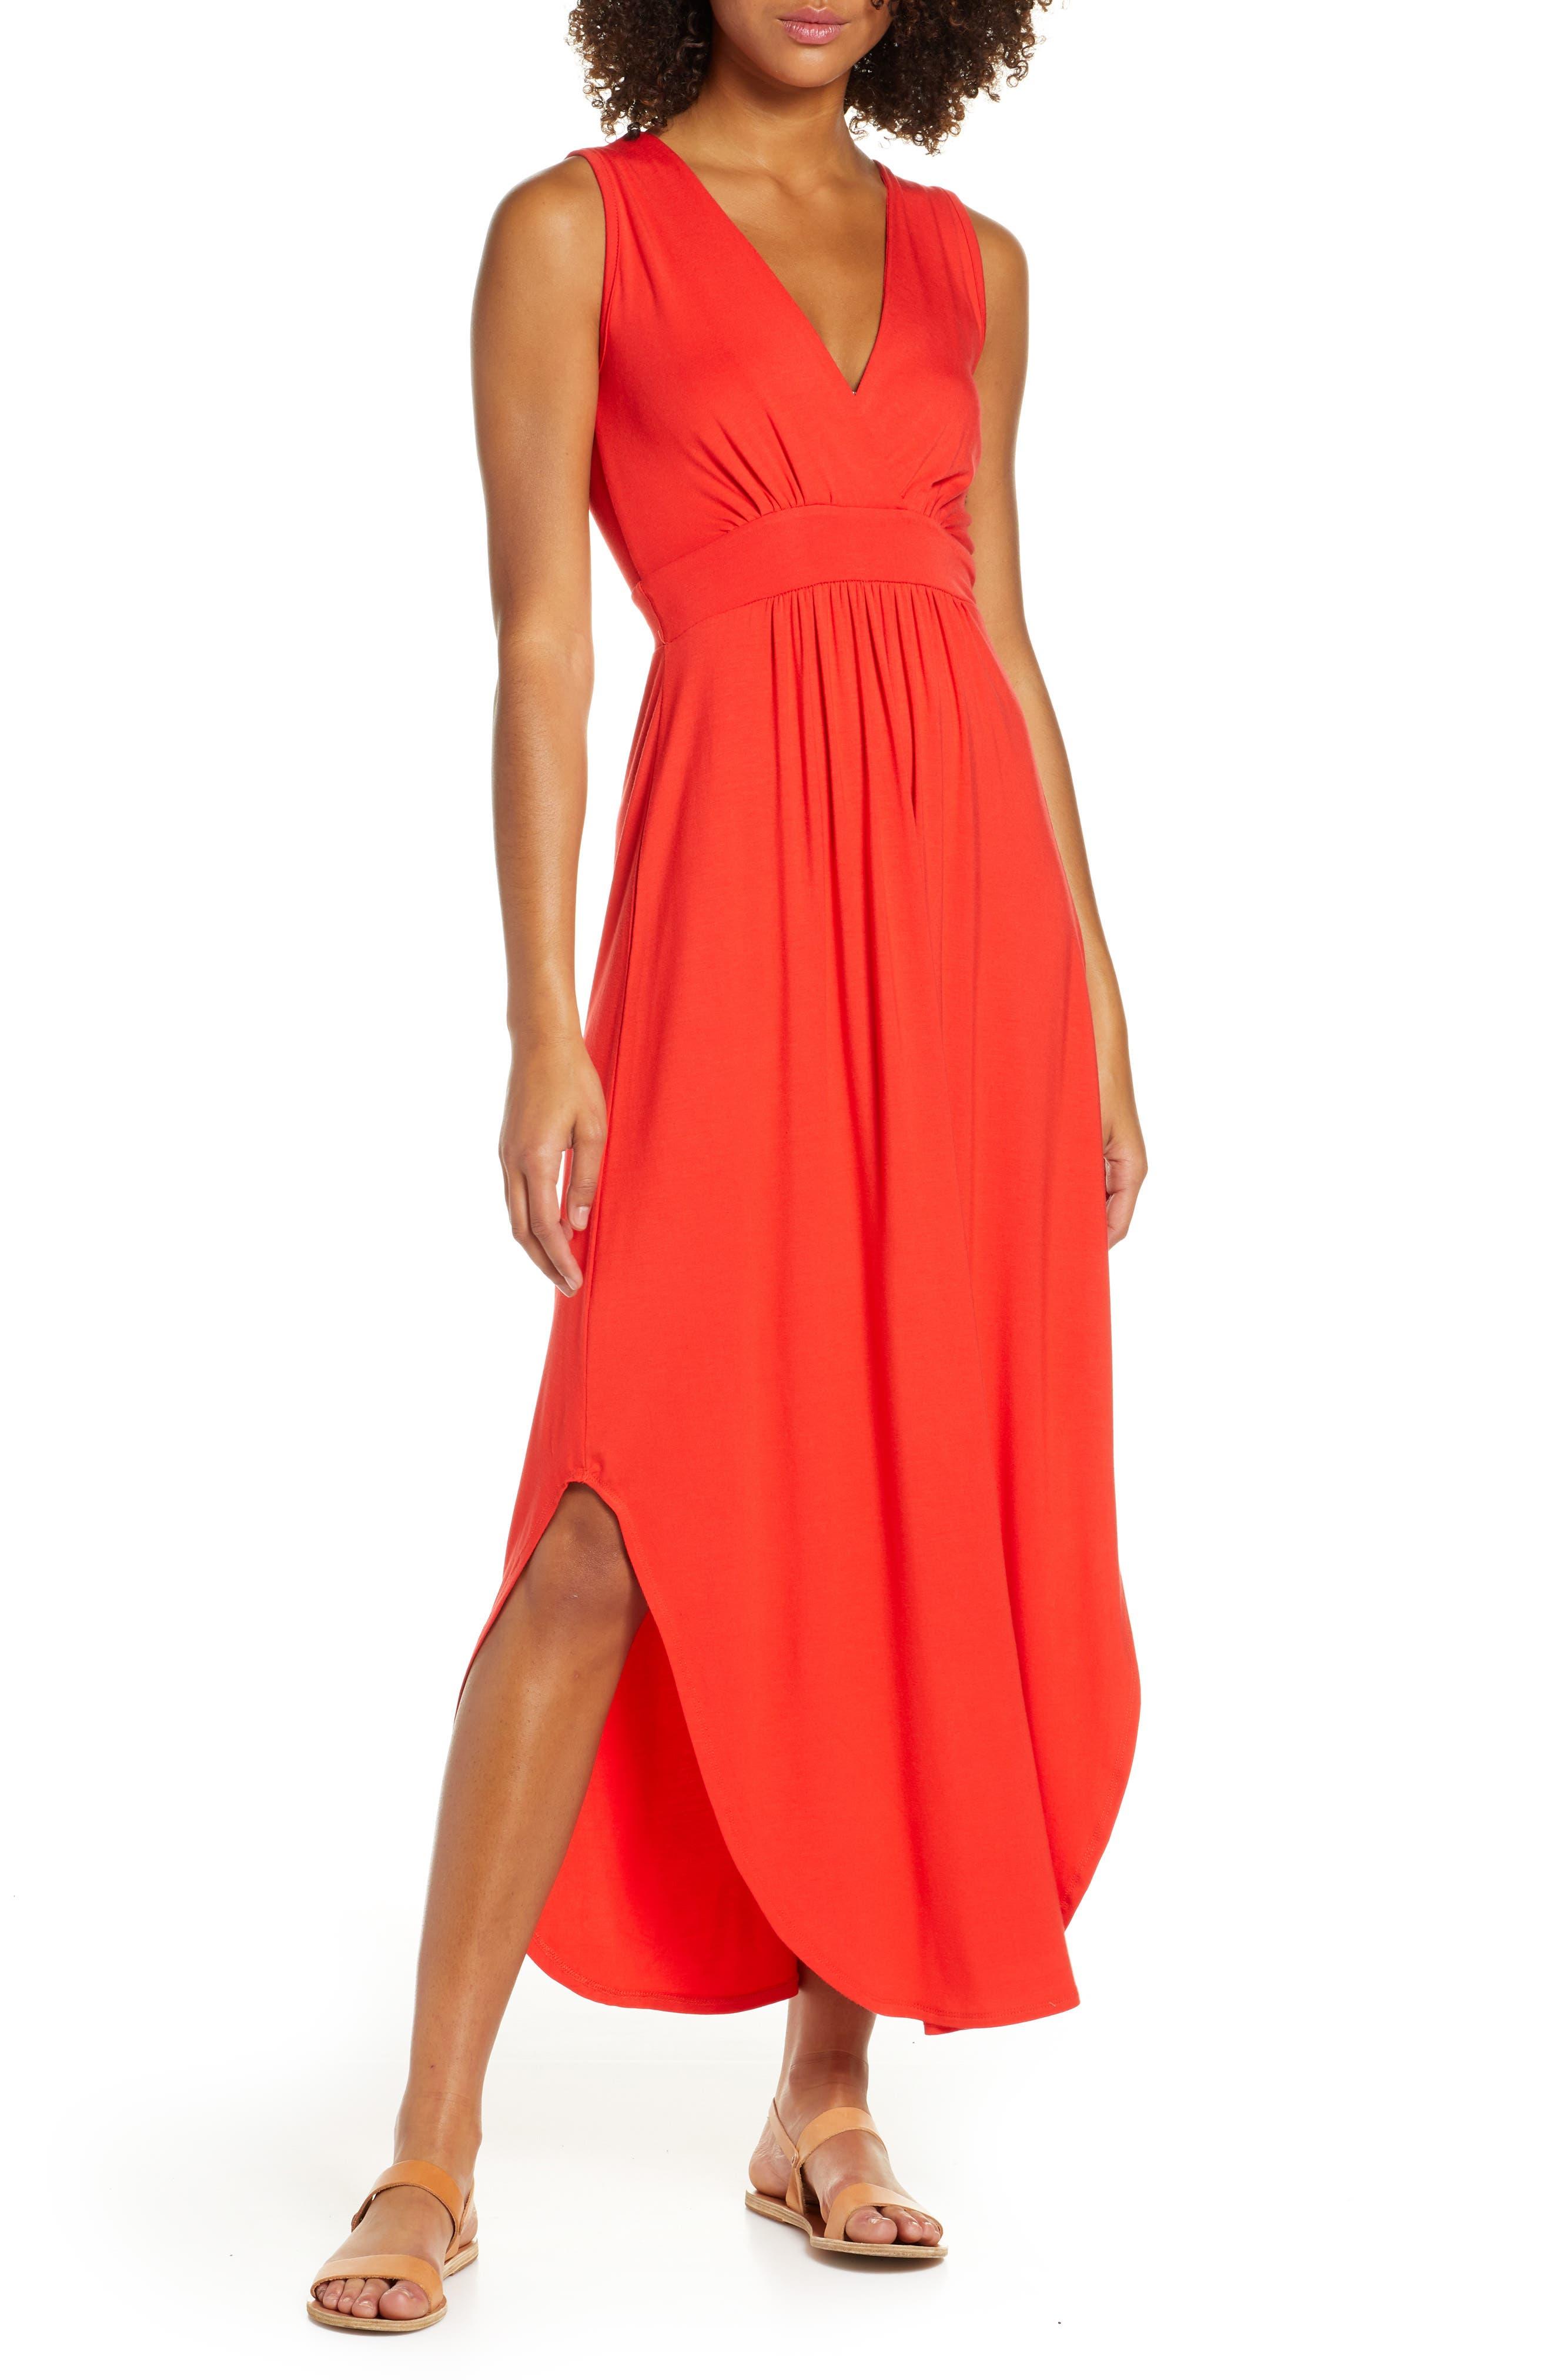 Beach Maxi Dresses